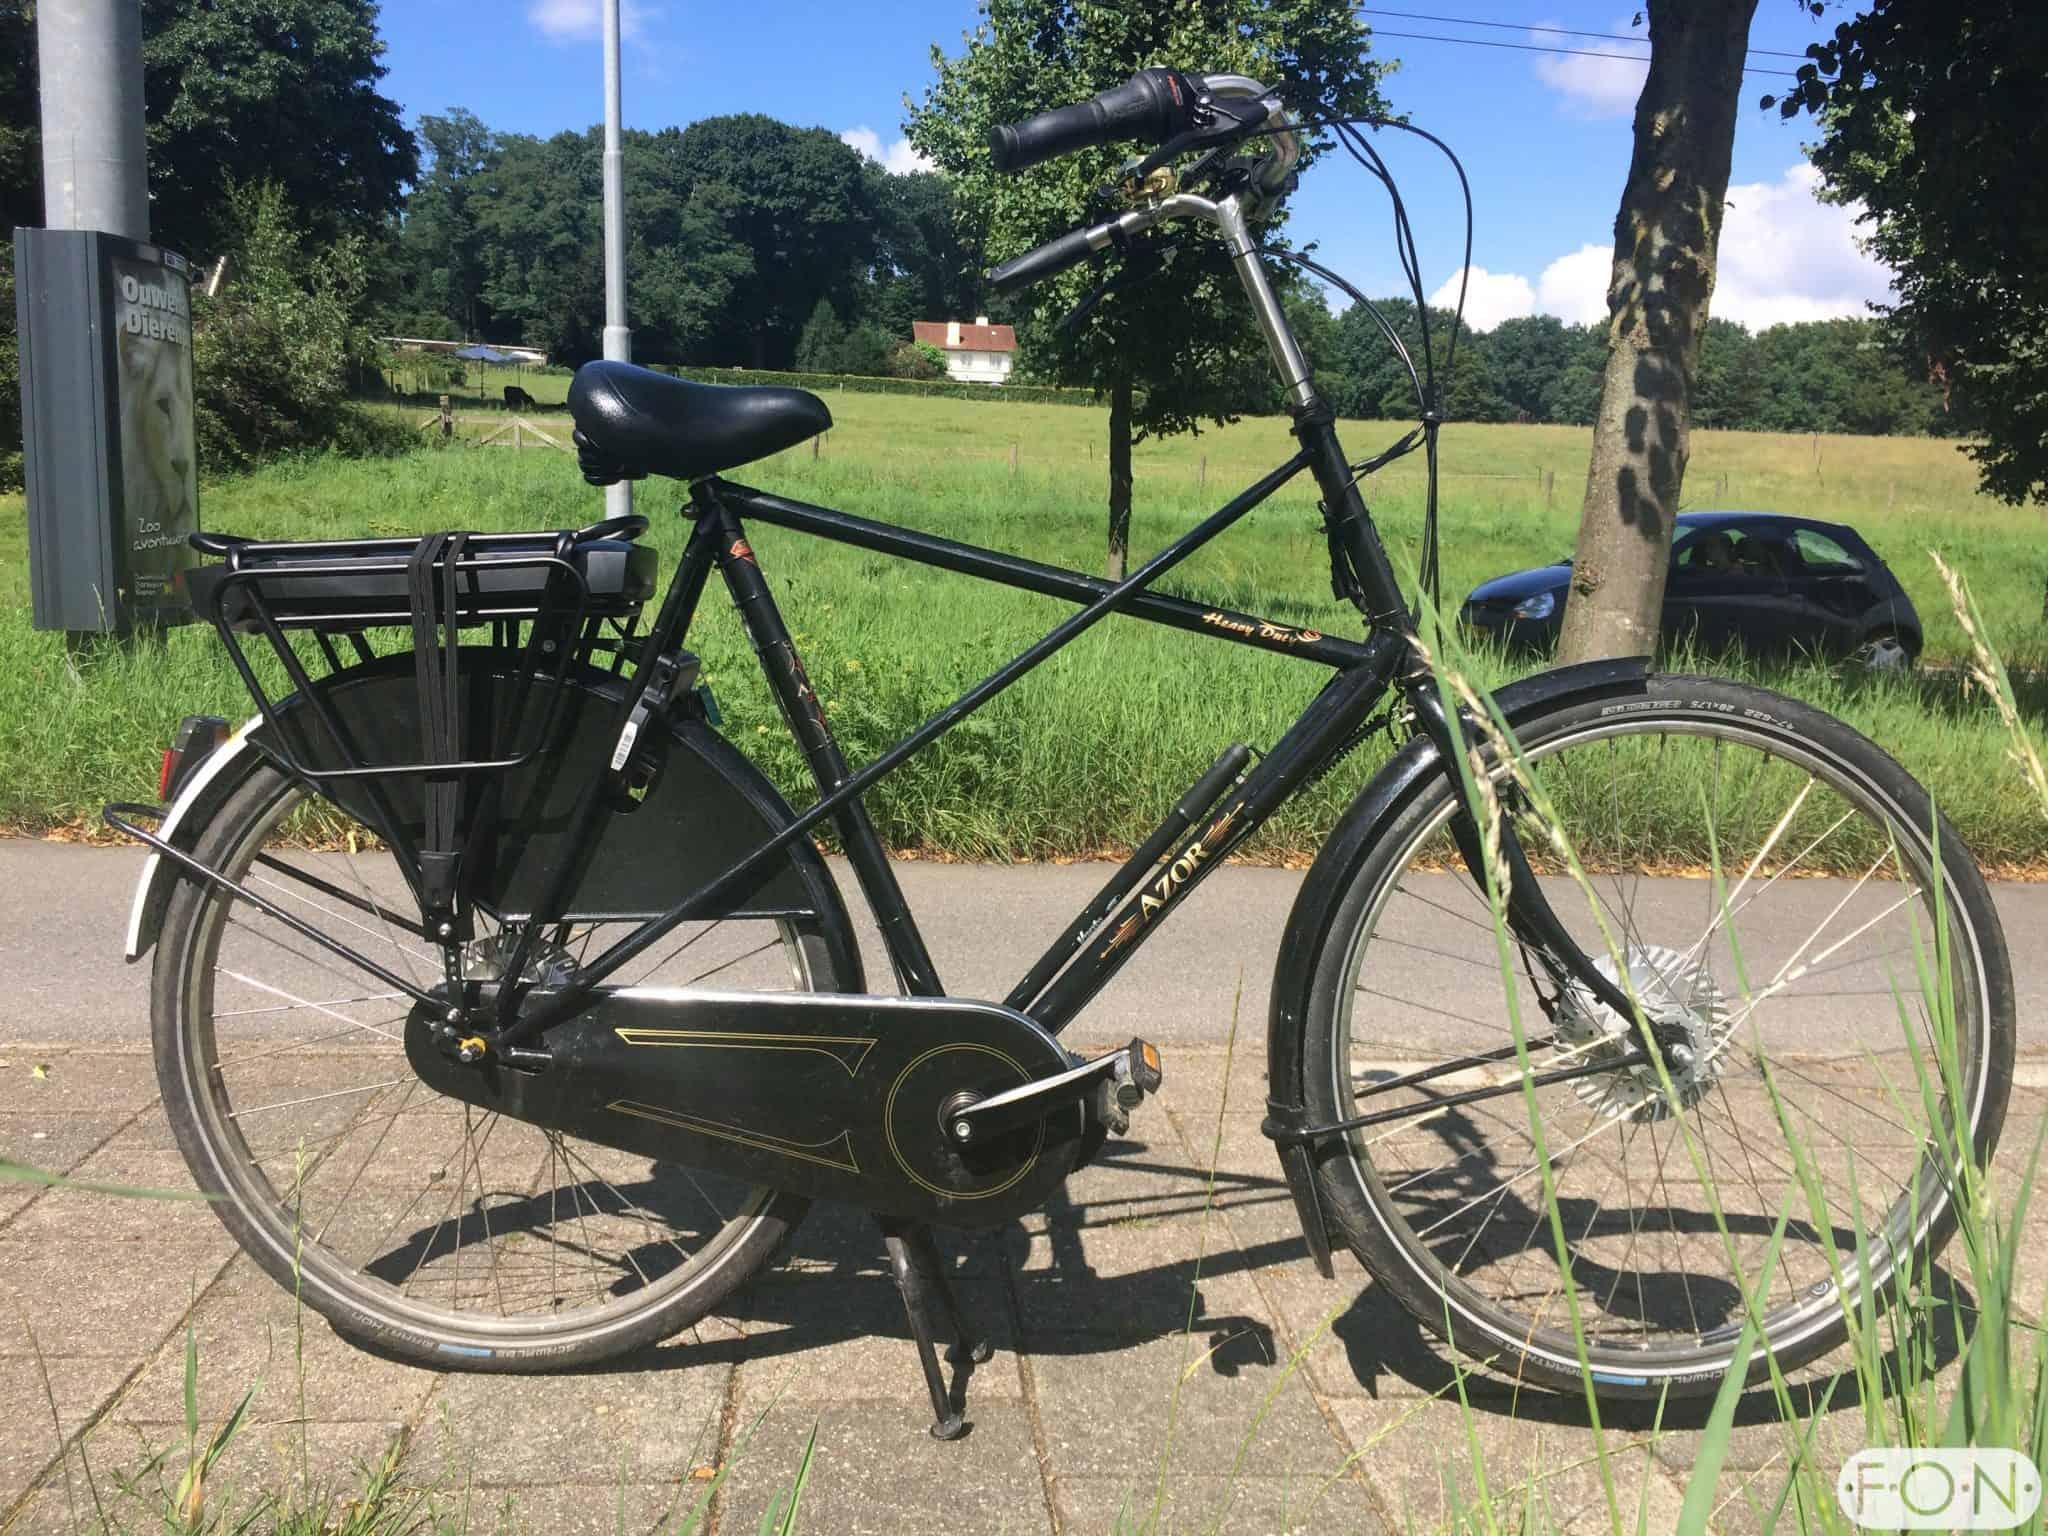 Azor Kruisframe Bafang Middenmotor FONebike Arnhem 2136